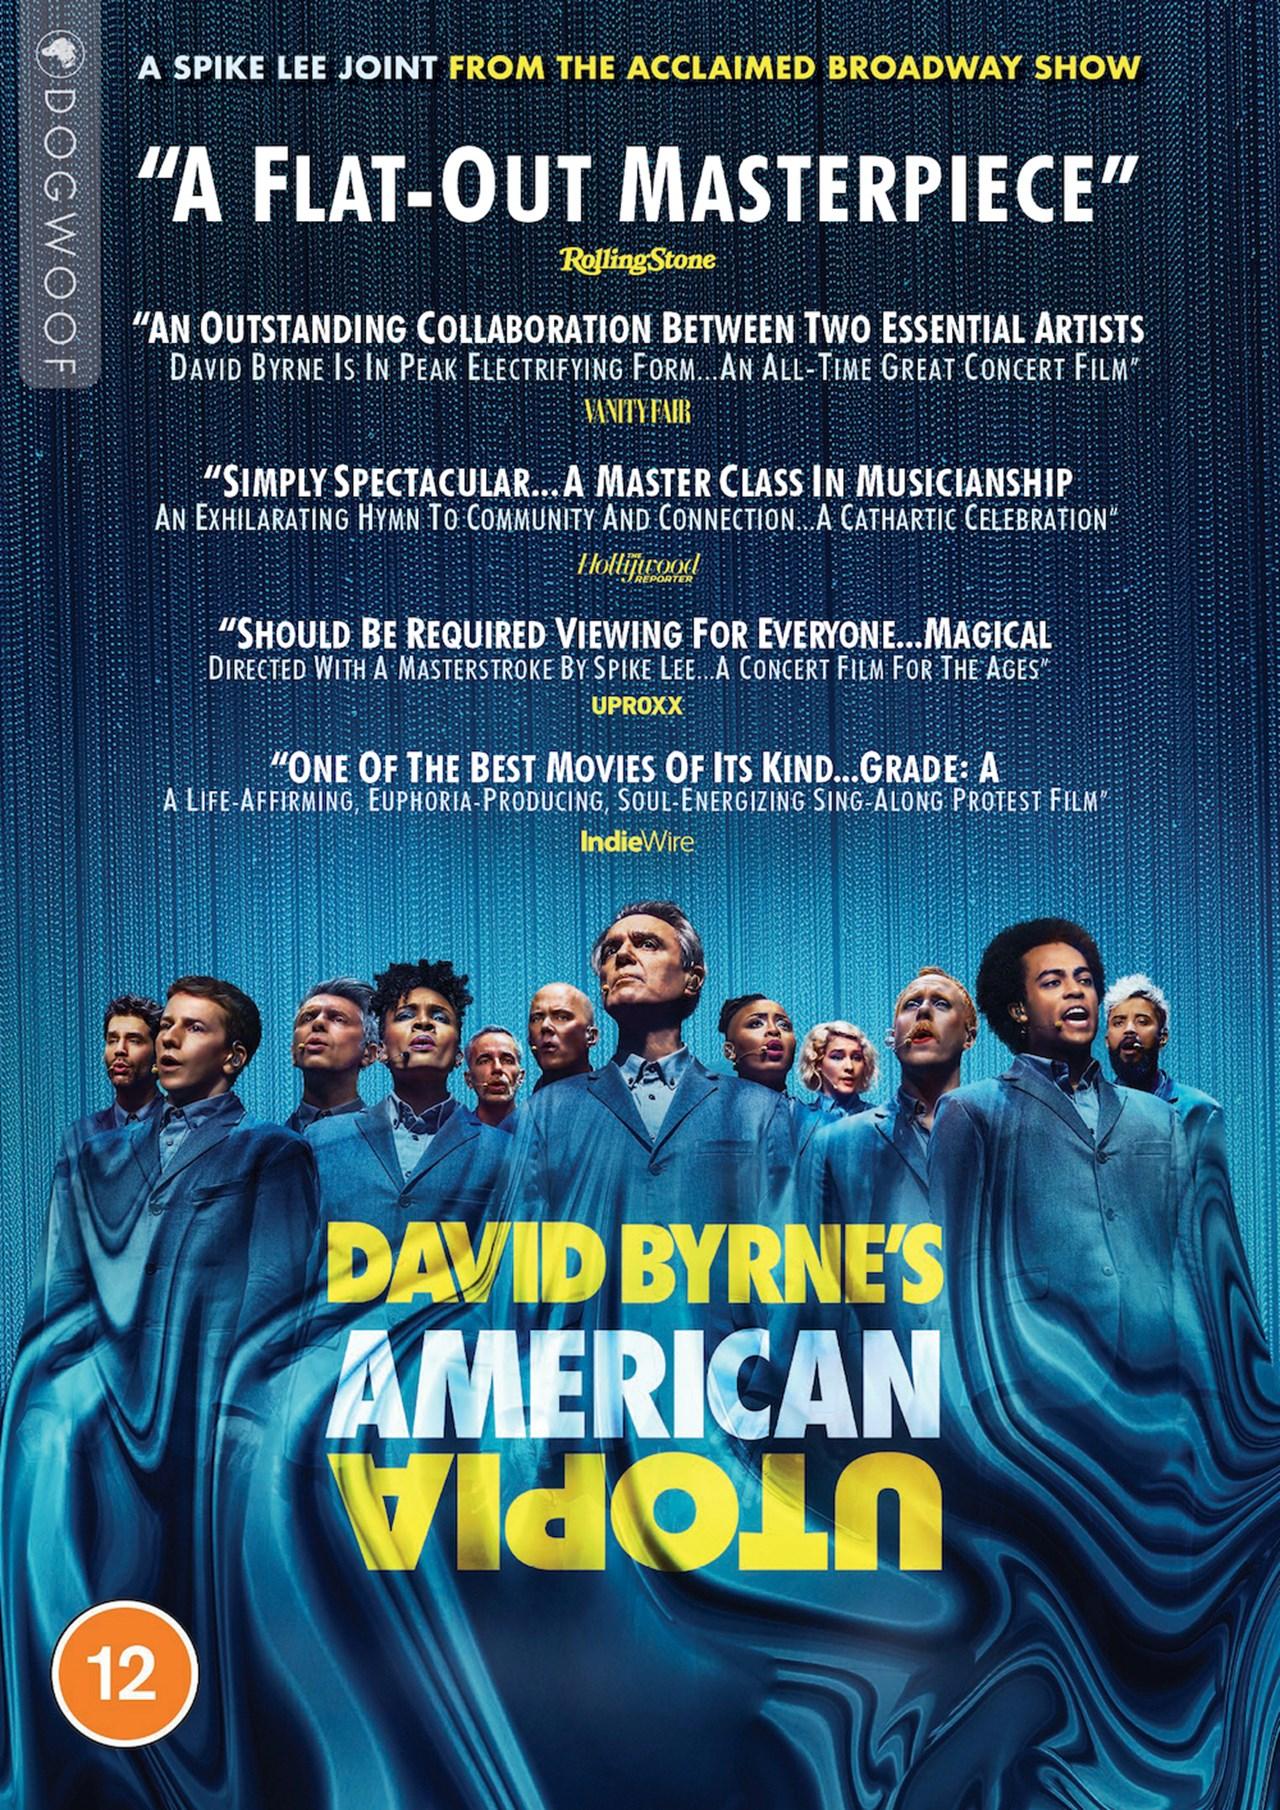 David Byrne's American Utopia - 1